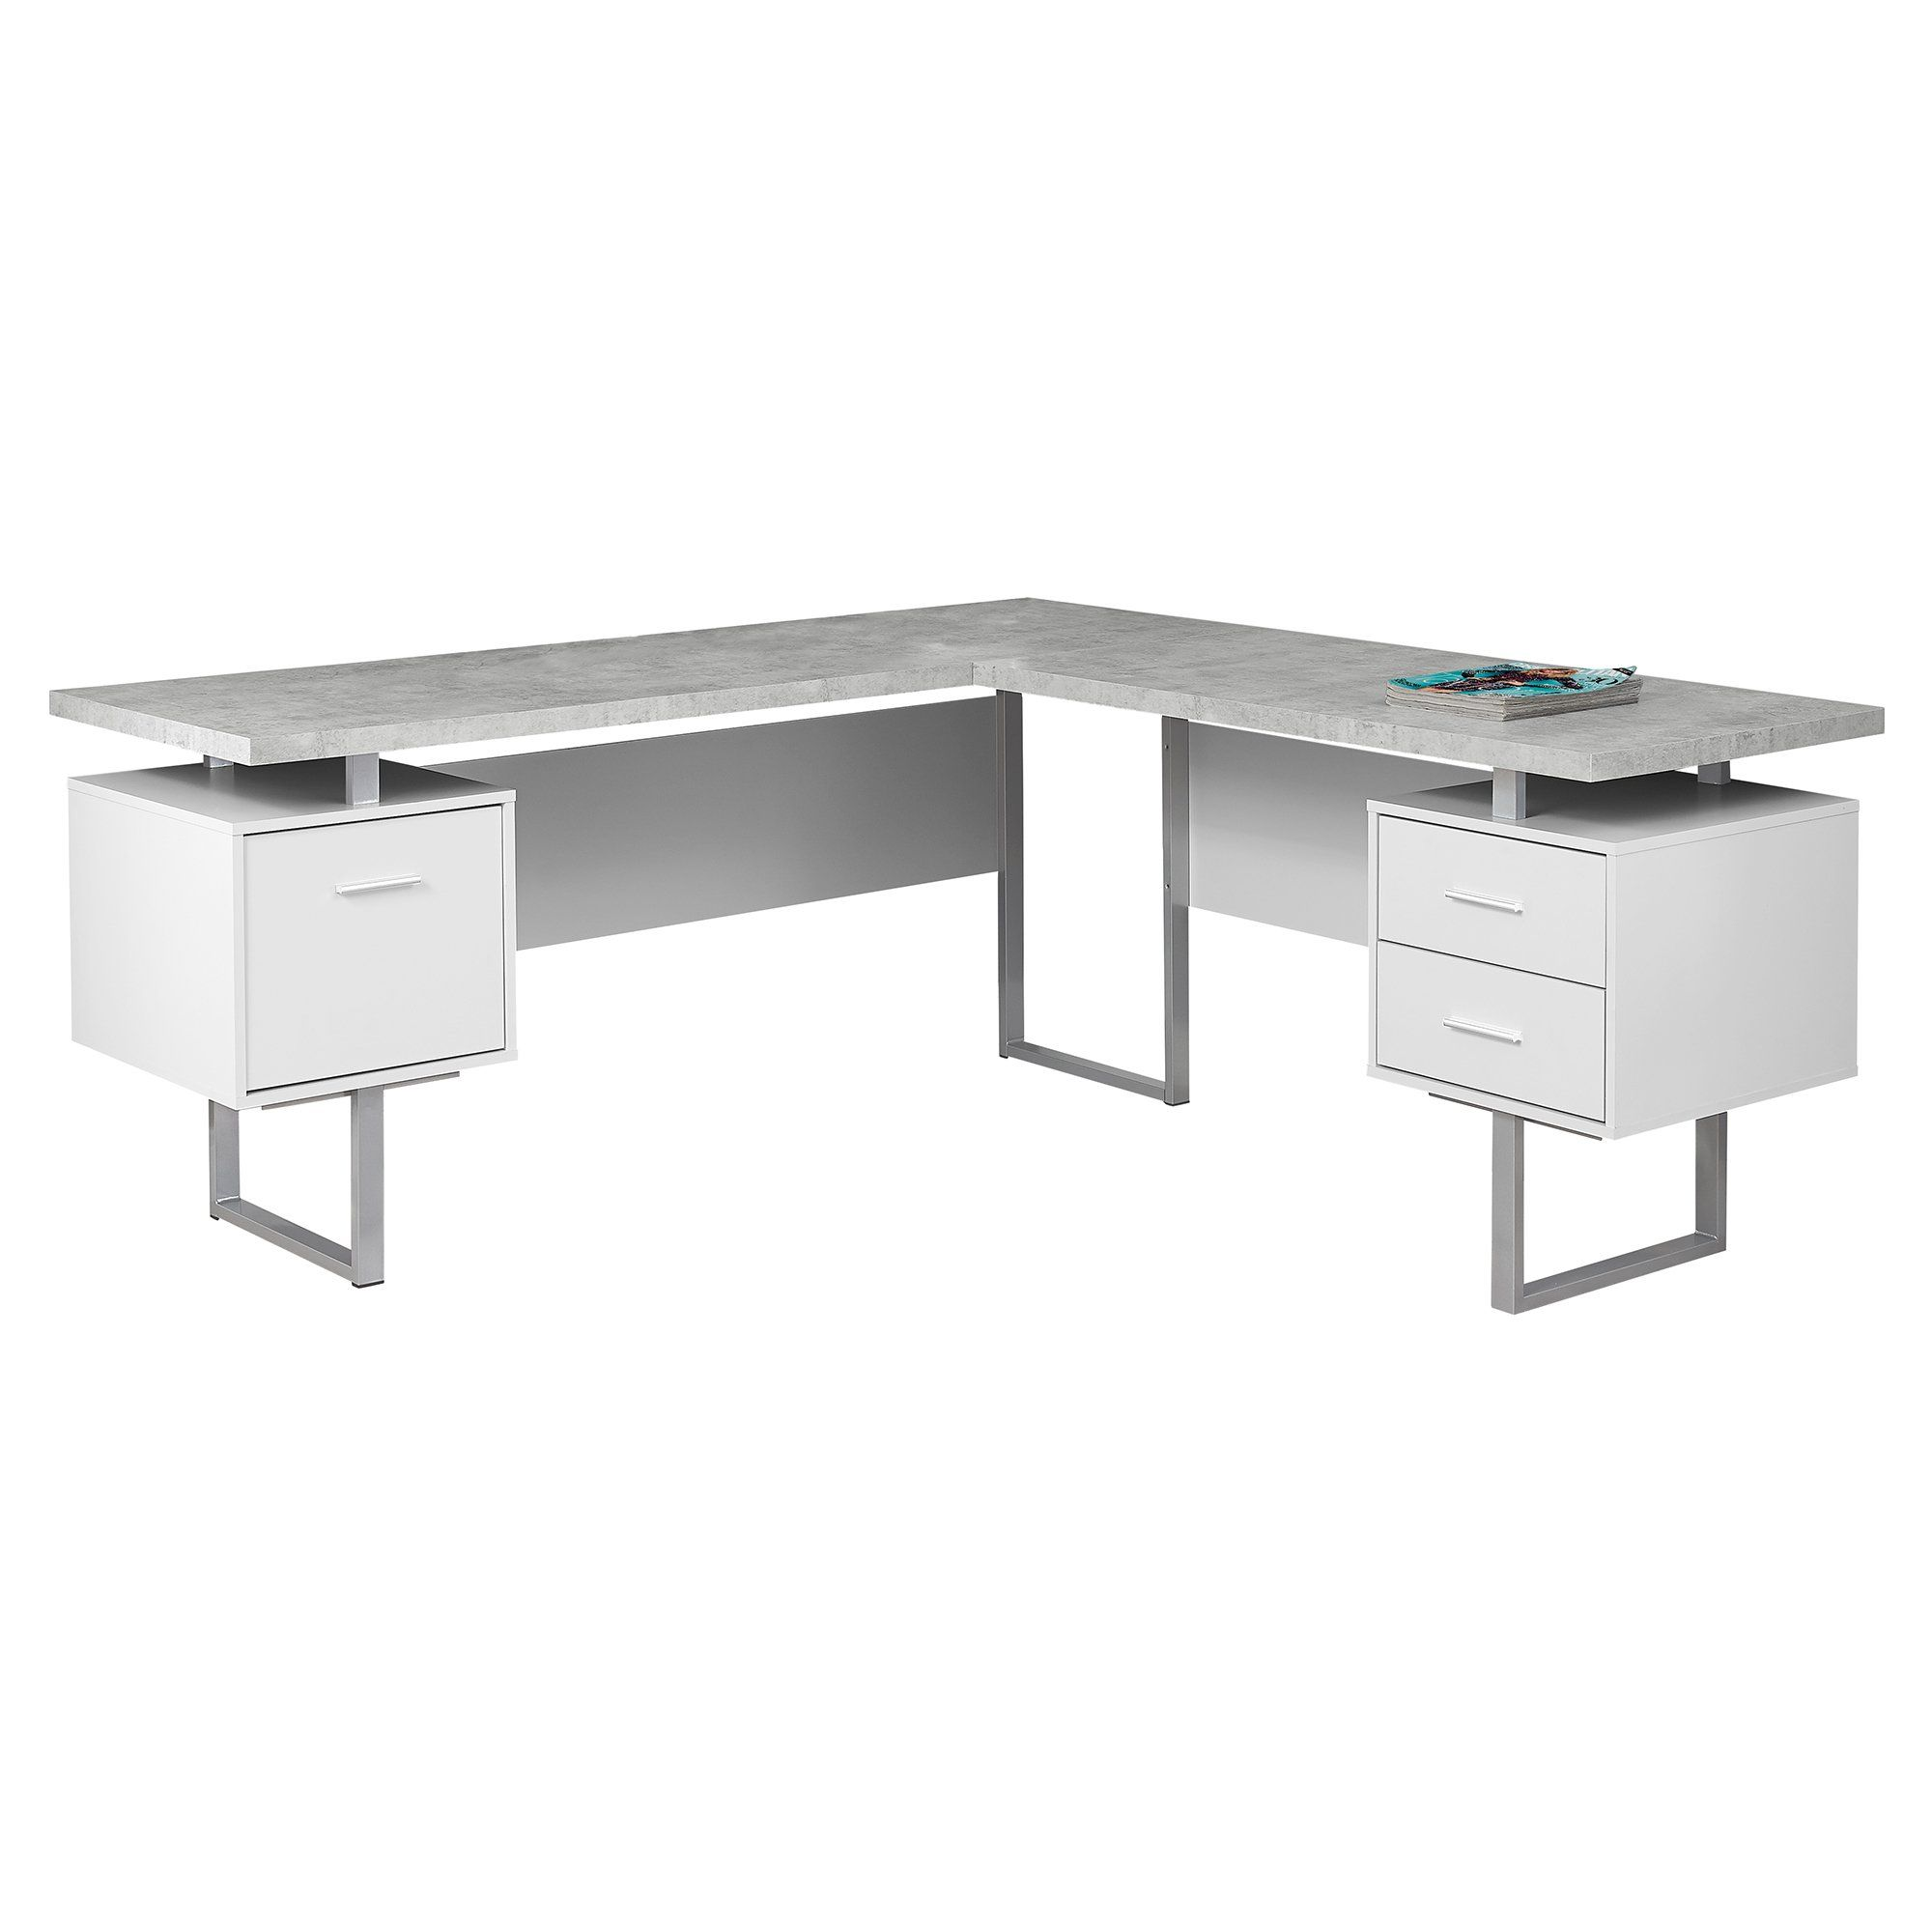 71 X 71 X 30 Grey Silver White Particle Board Hollow Core Metal Computer Desk Trivoshop In 2021 White Computer Desk Metal Computer Desk Corner Computer Desk